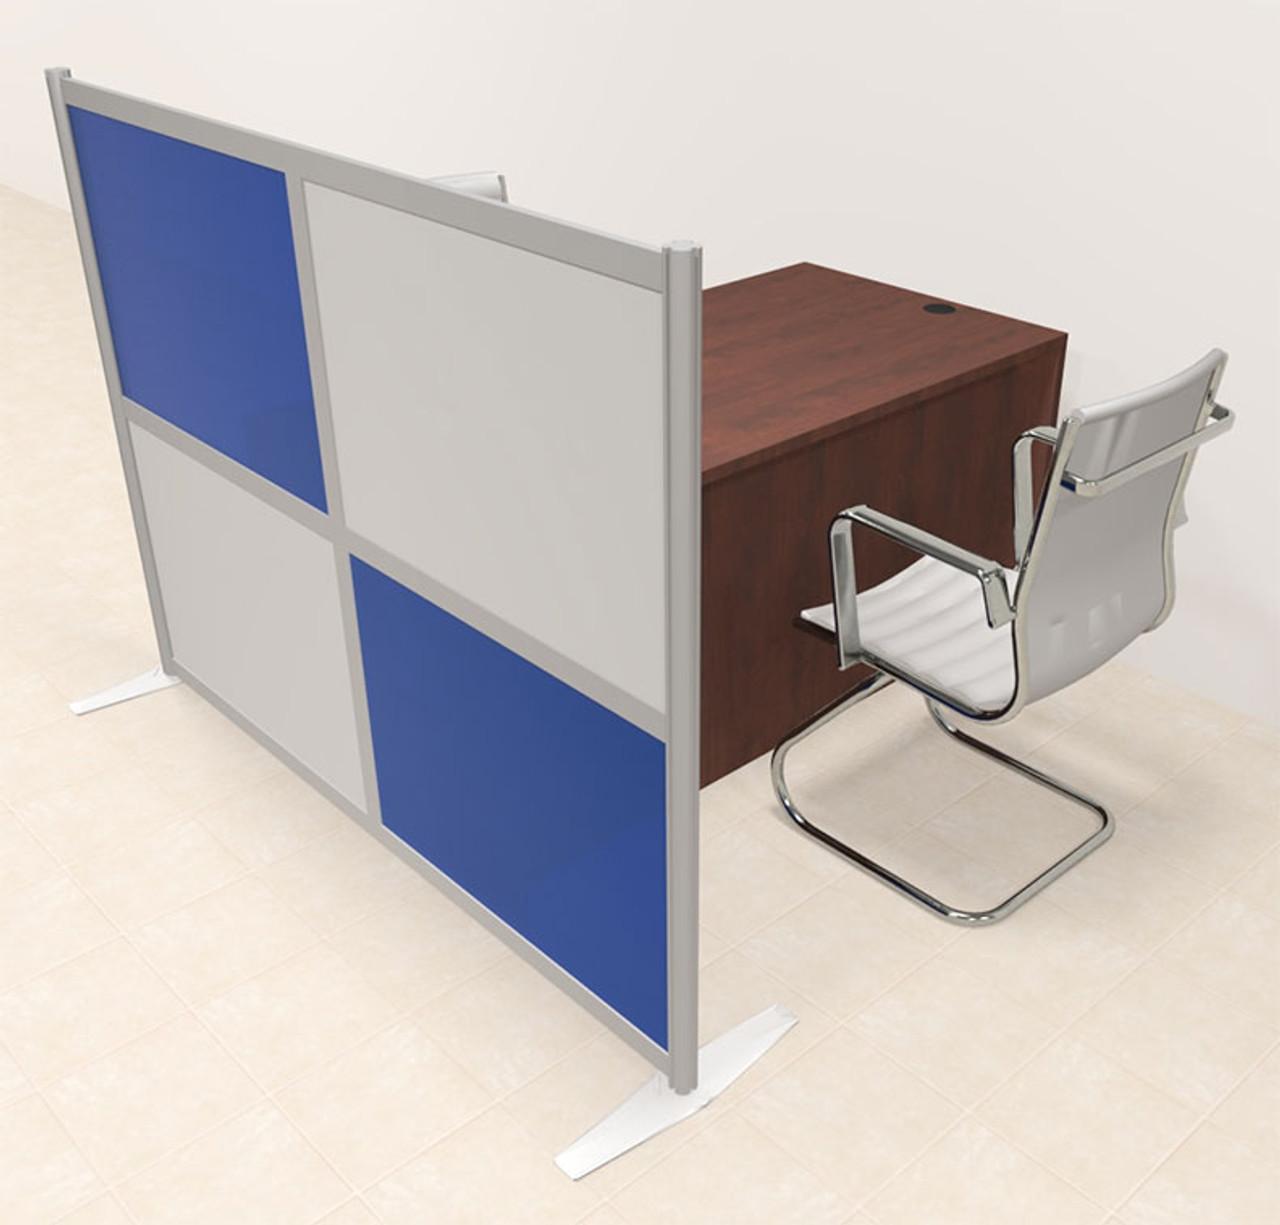 One Person Workstation w/Acrylic Aluminum Privacy Panel, #OT-SUL-HPB14